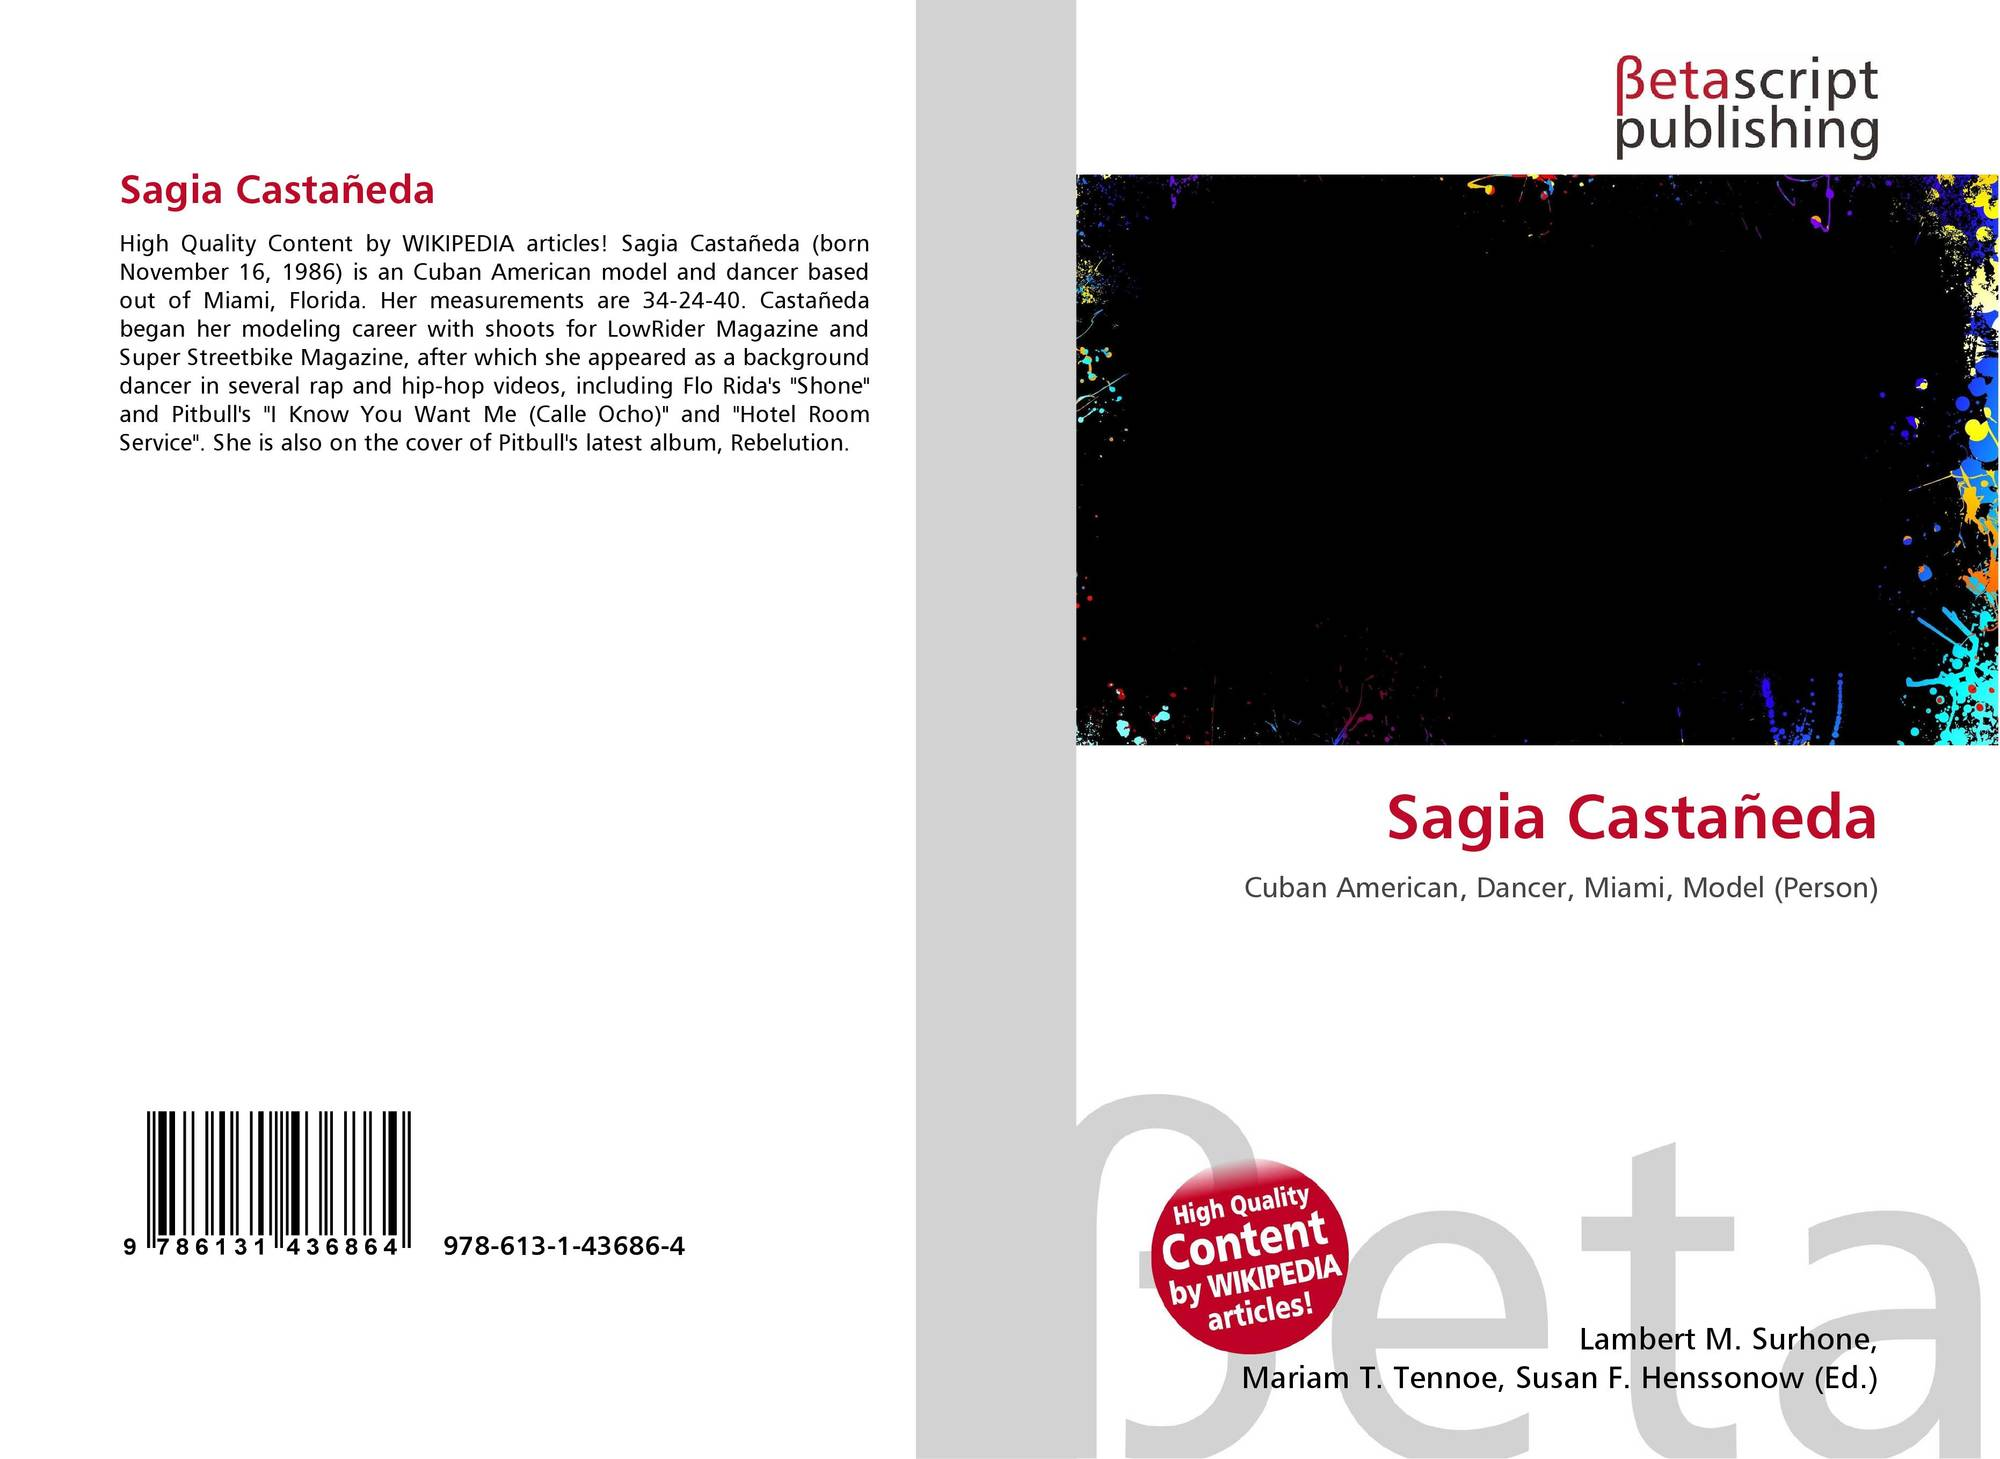 Sagia Castaneda Nude Photos 60